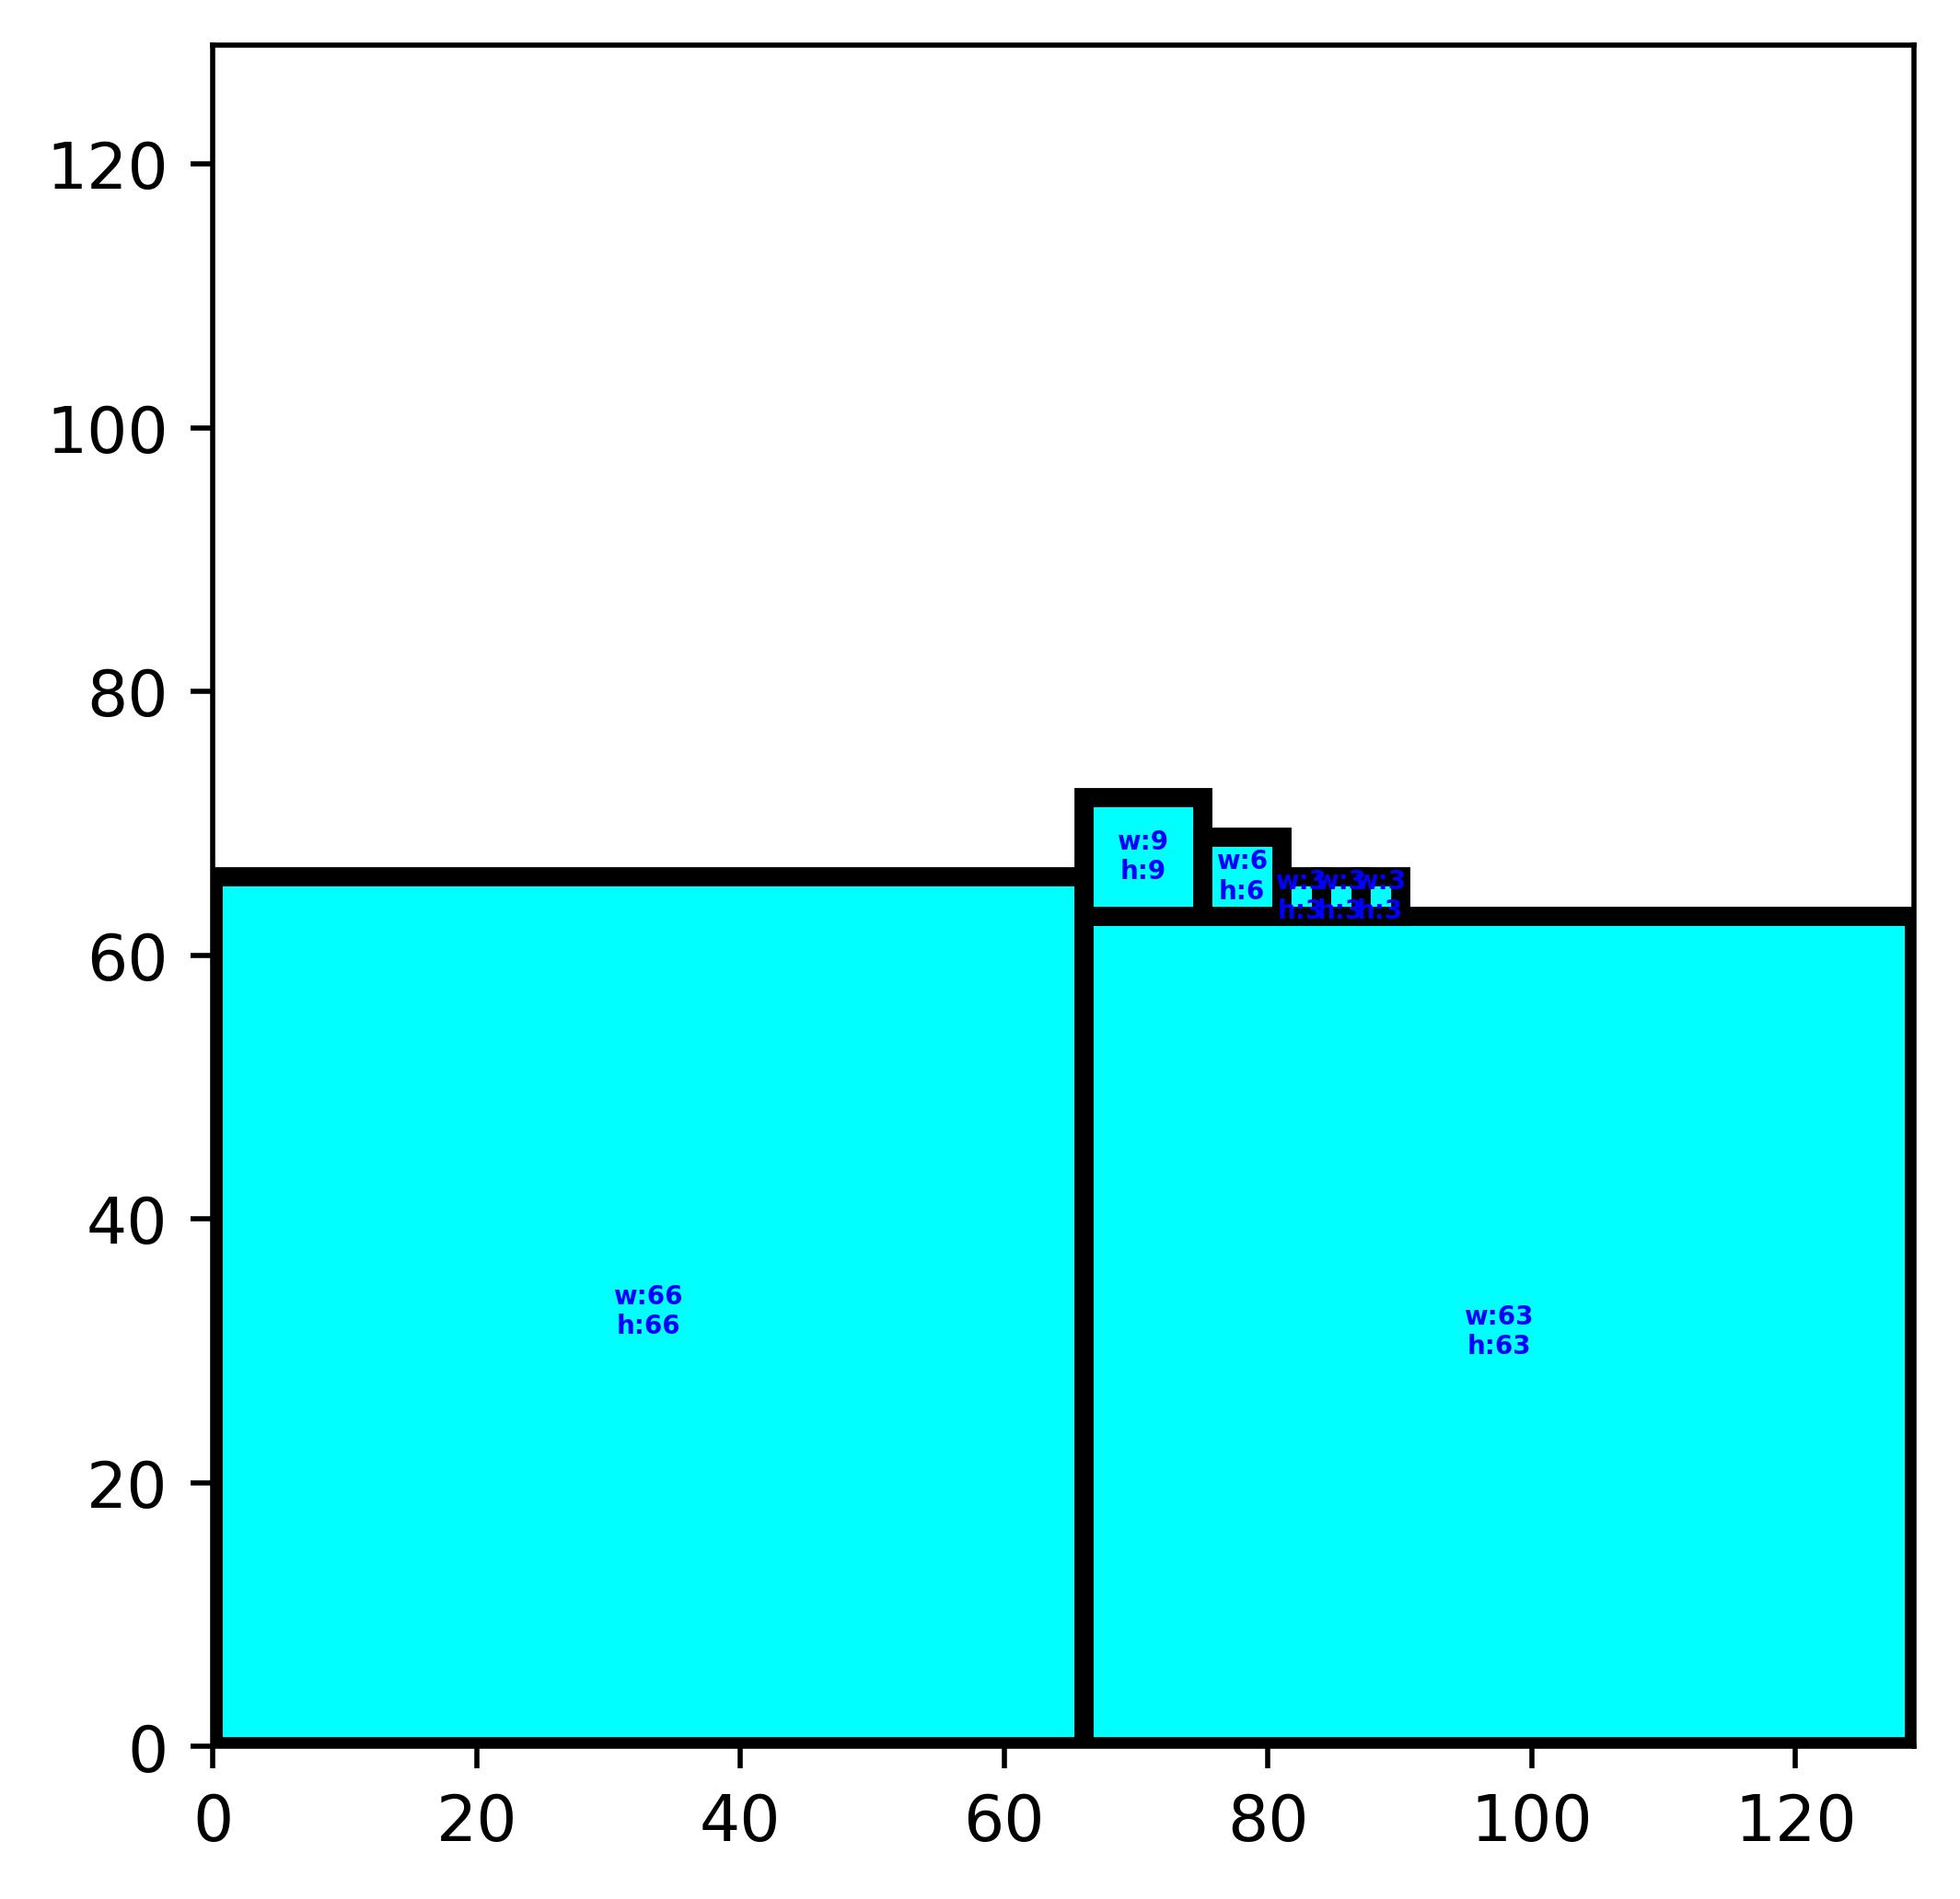 optimization_algo/packing_screenshots/AlphaGoZero/pack_size_129/penalty_constant_0/k=7_max=17280_latency=102617.png